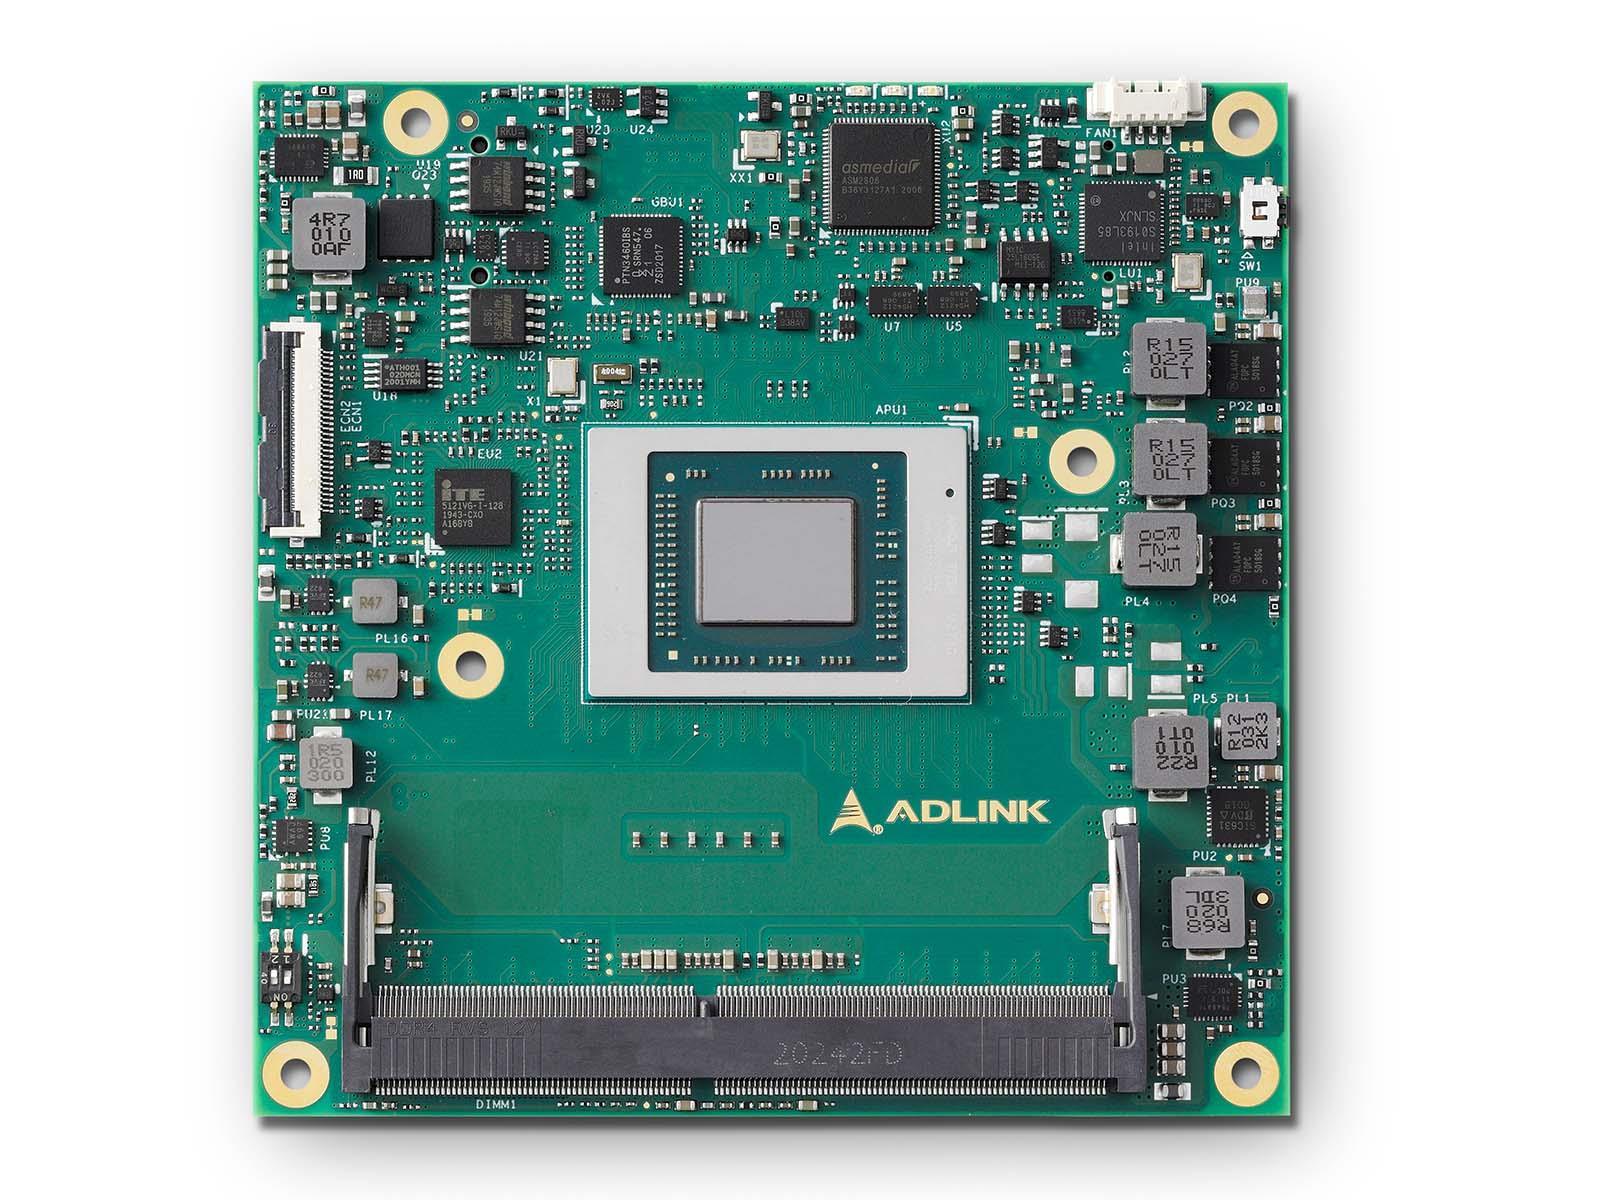 AMD Ryzen V2000 COM Express Type 6 Compact embedded Computer-on-Module